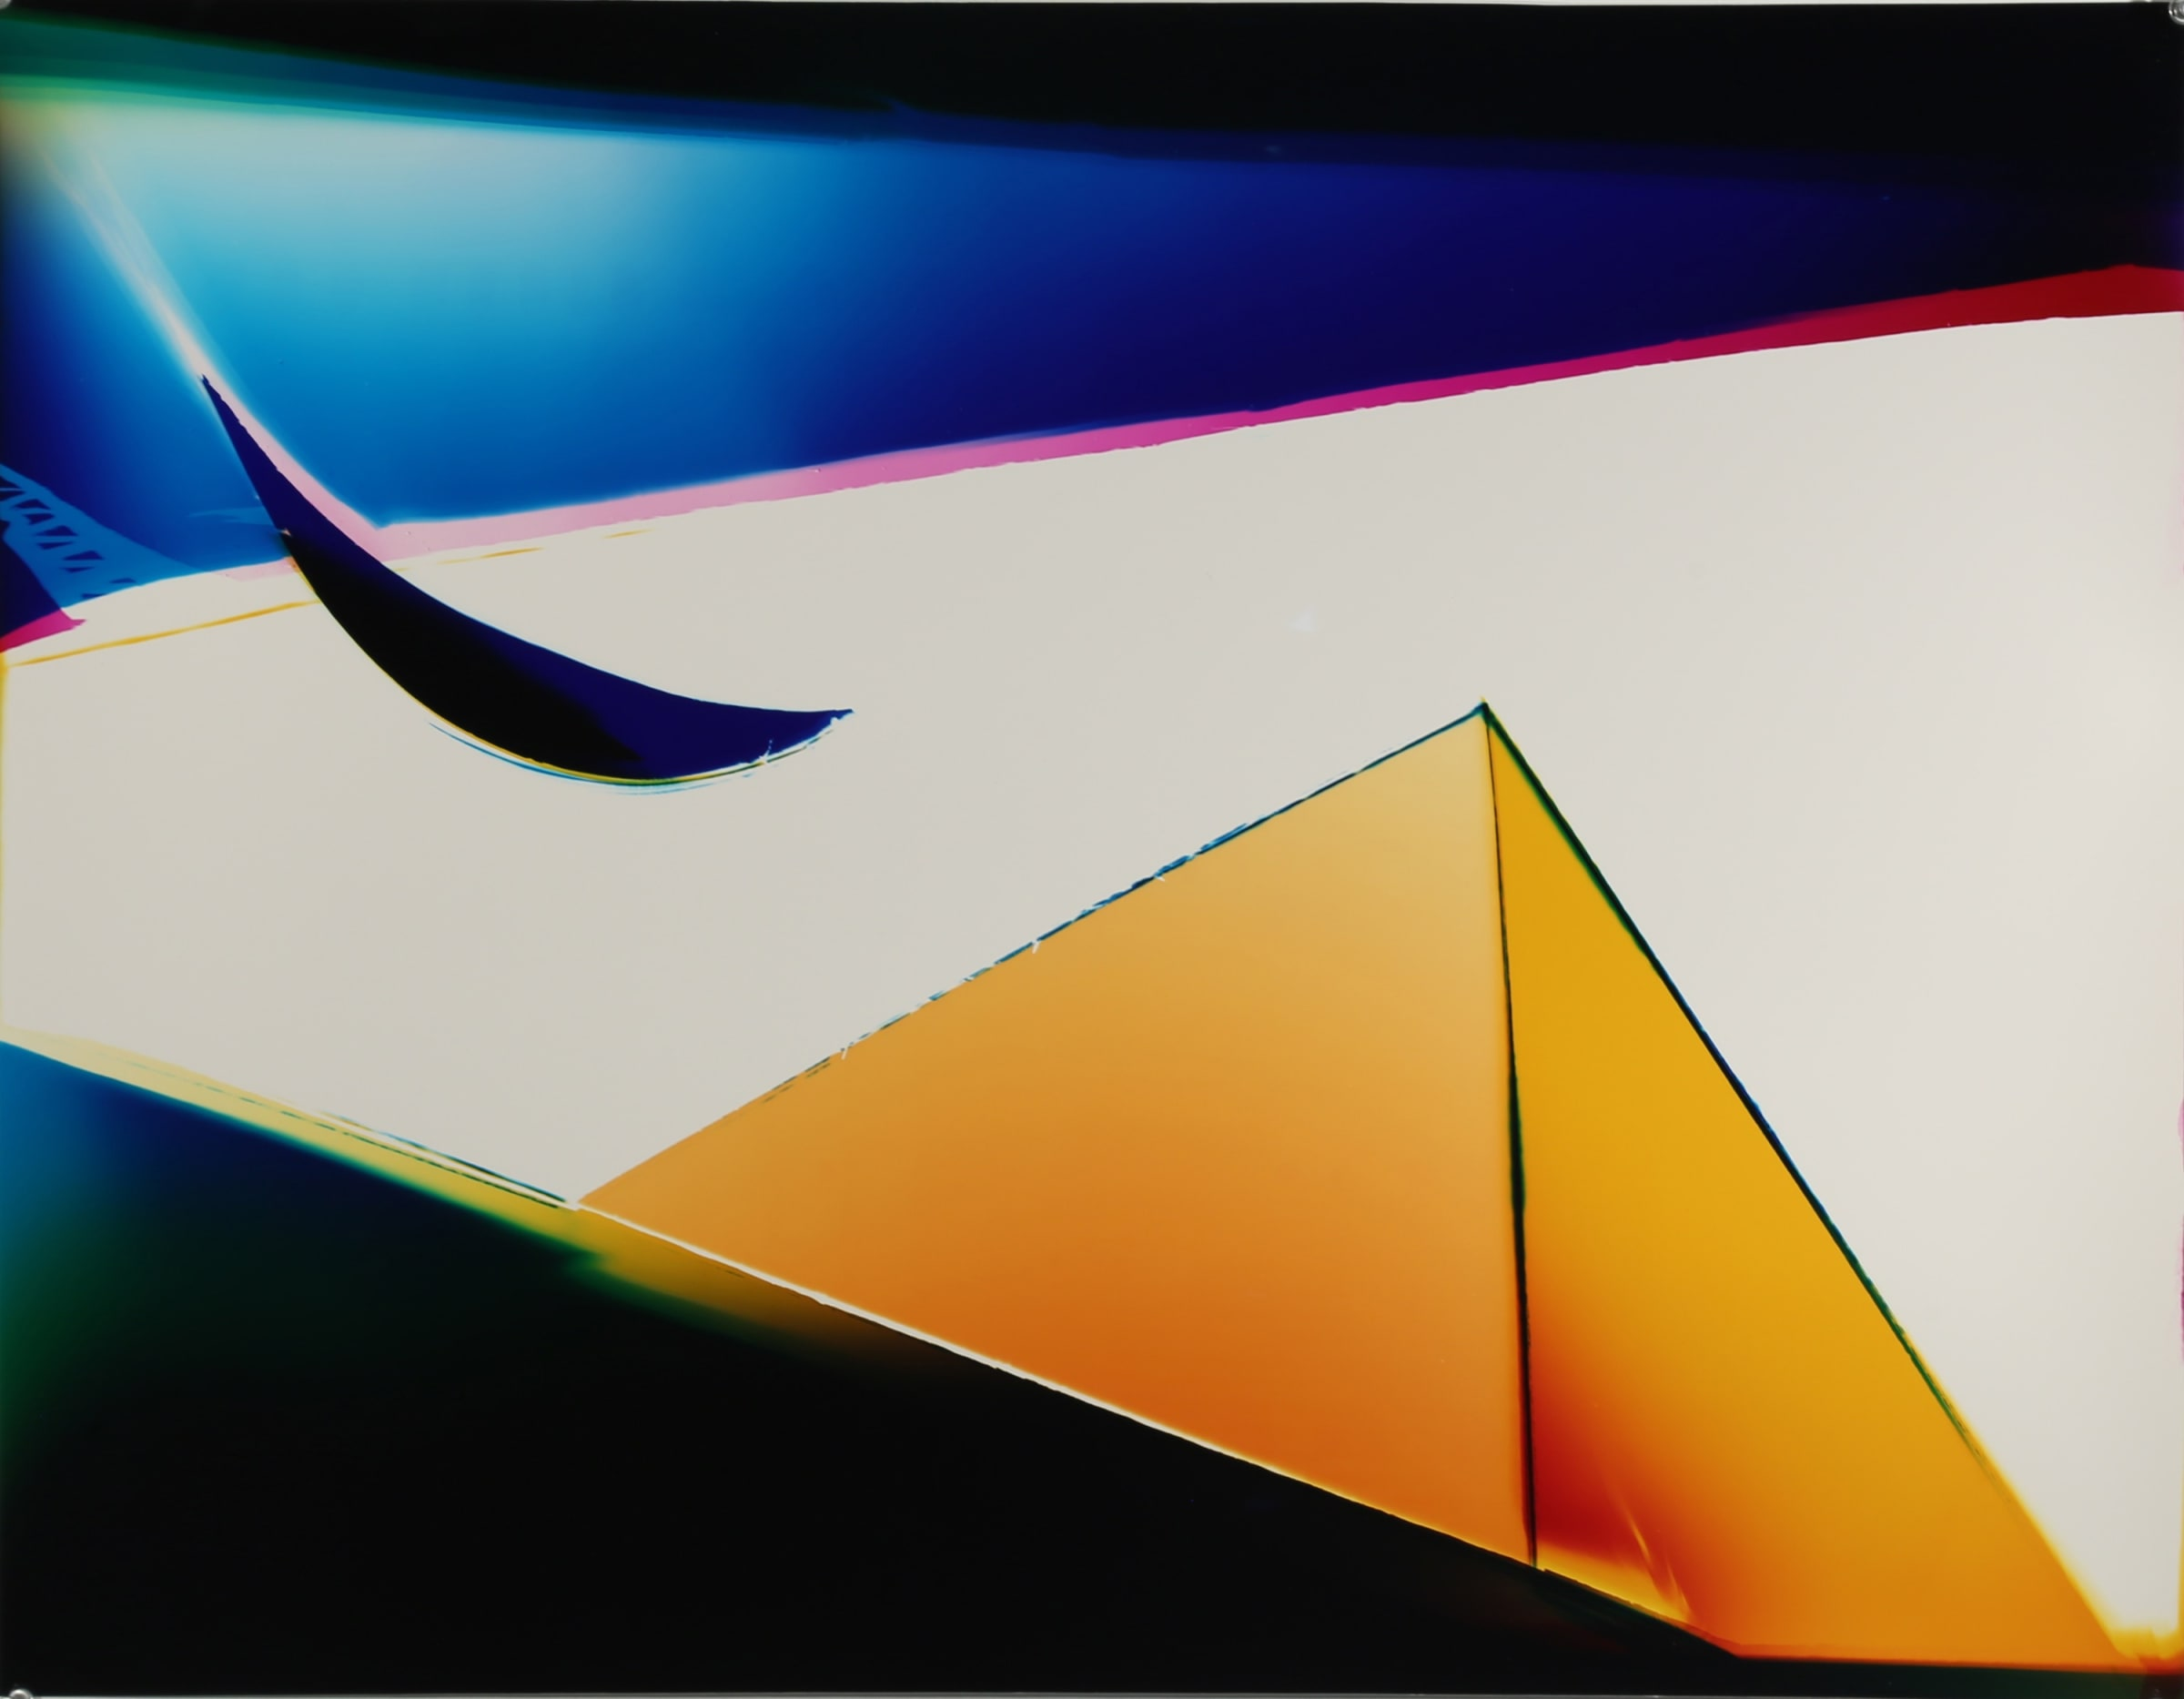 "<span class=""link fancybox-details-link""><a href=""/exhibitions/11/works/artworks122/"">View Detail Page</a></span><div class=""artist""><strong>Liz Nielsen</strong></div><div class=""title""><em>Golden Vortex</em>, 2018</div><div class=""signed_and_dated"">Signed, titled and dated on artist's label</div><div class=""medium"">Analogue Chromogenic Photogram on Fujiflex, Unique</div><div class=""dimensions"">75.9 x 58.8 cm<br>29 7/8 x 23 1/8 in</div>"